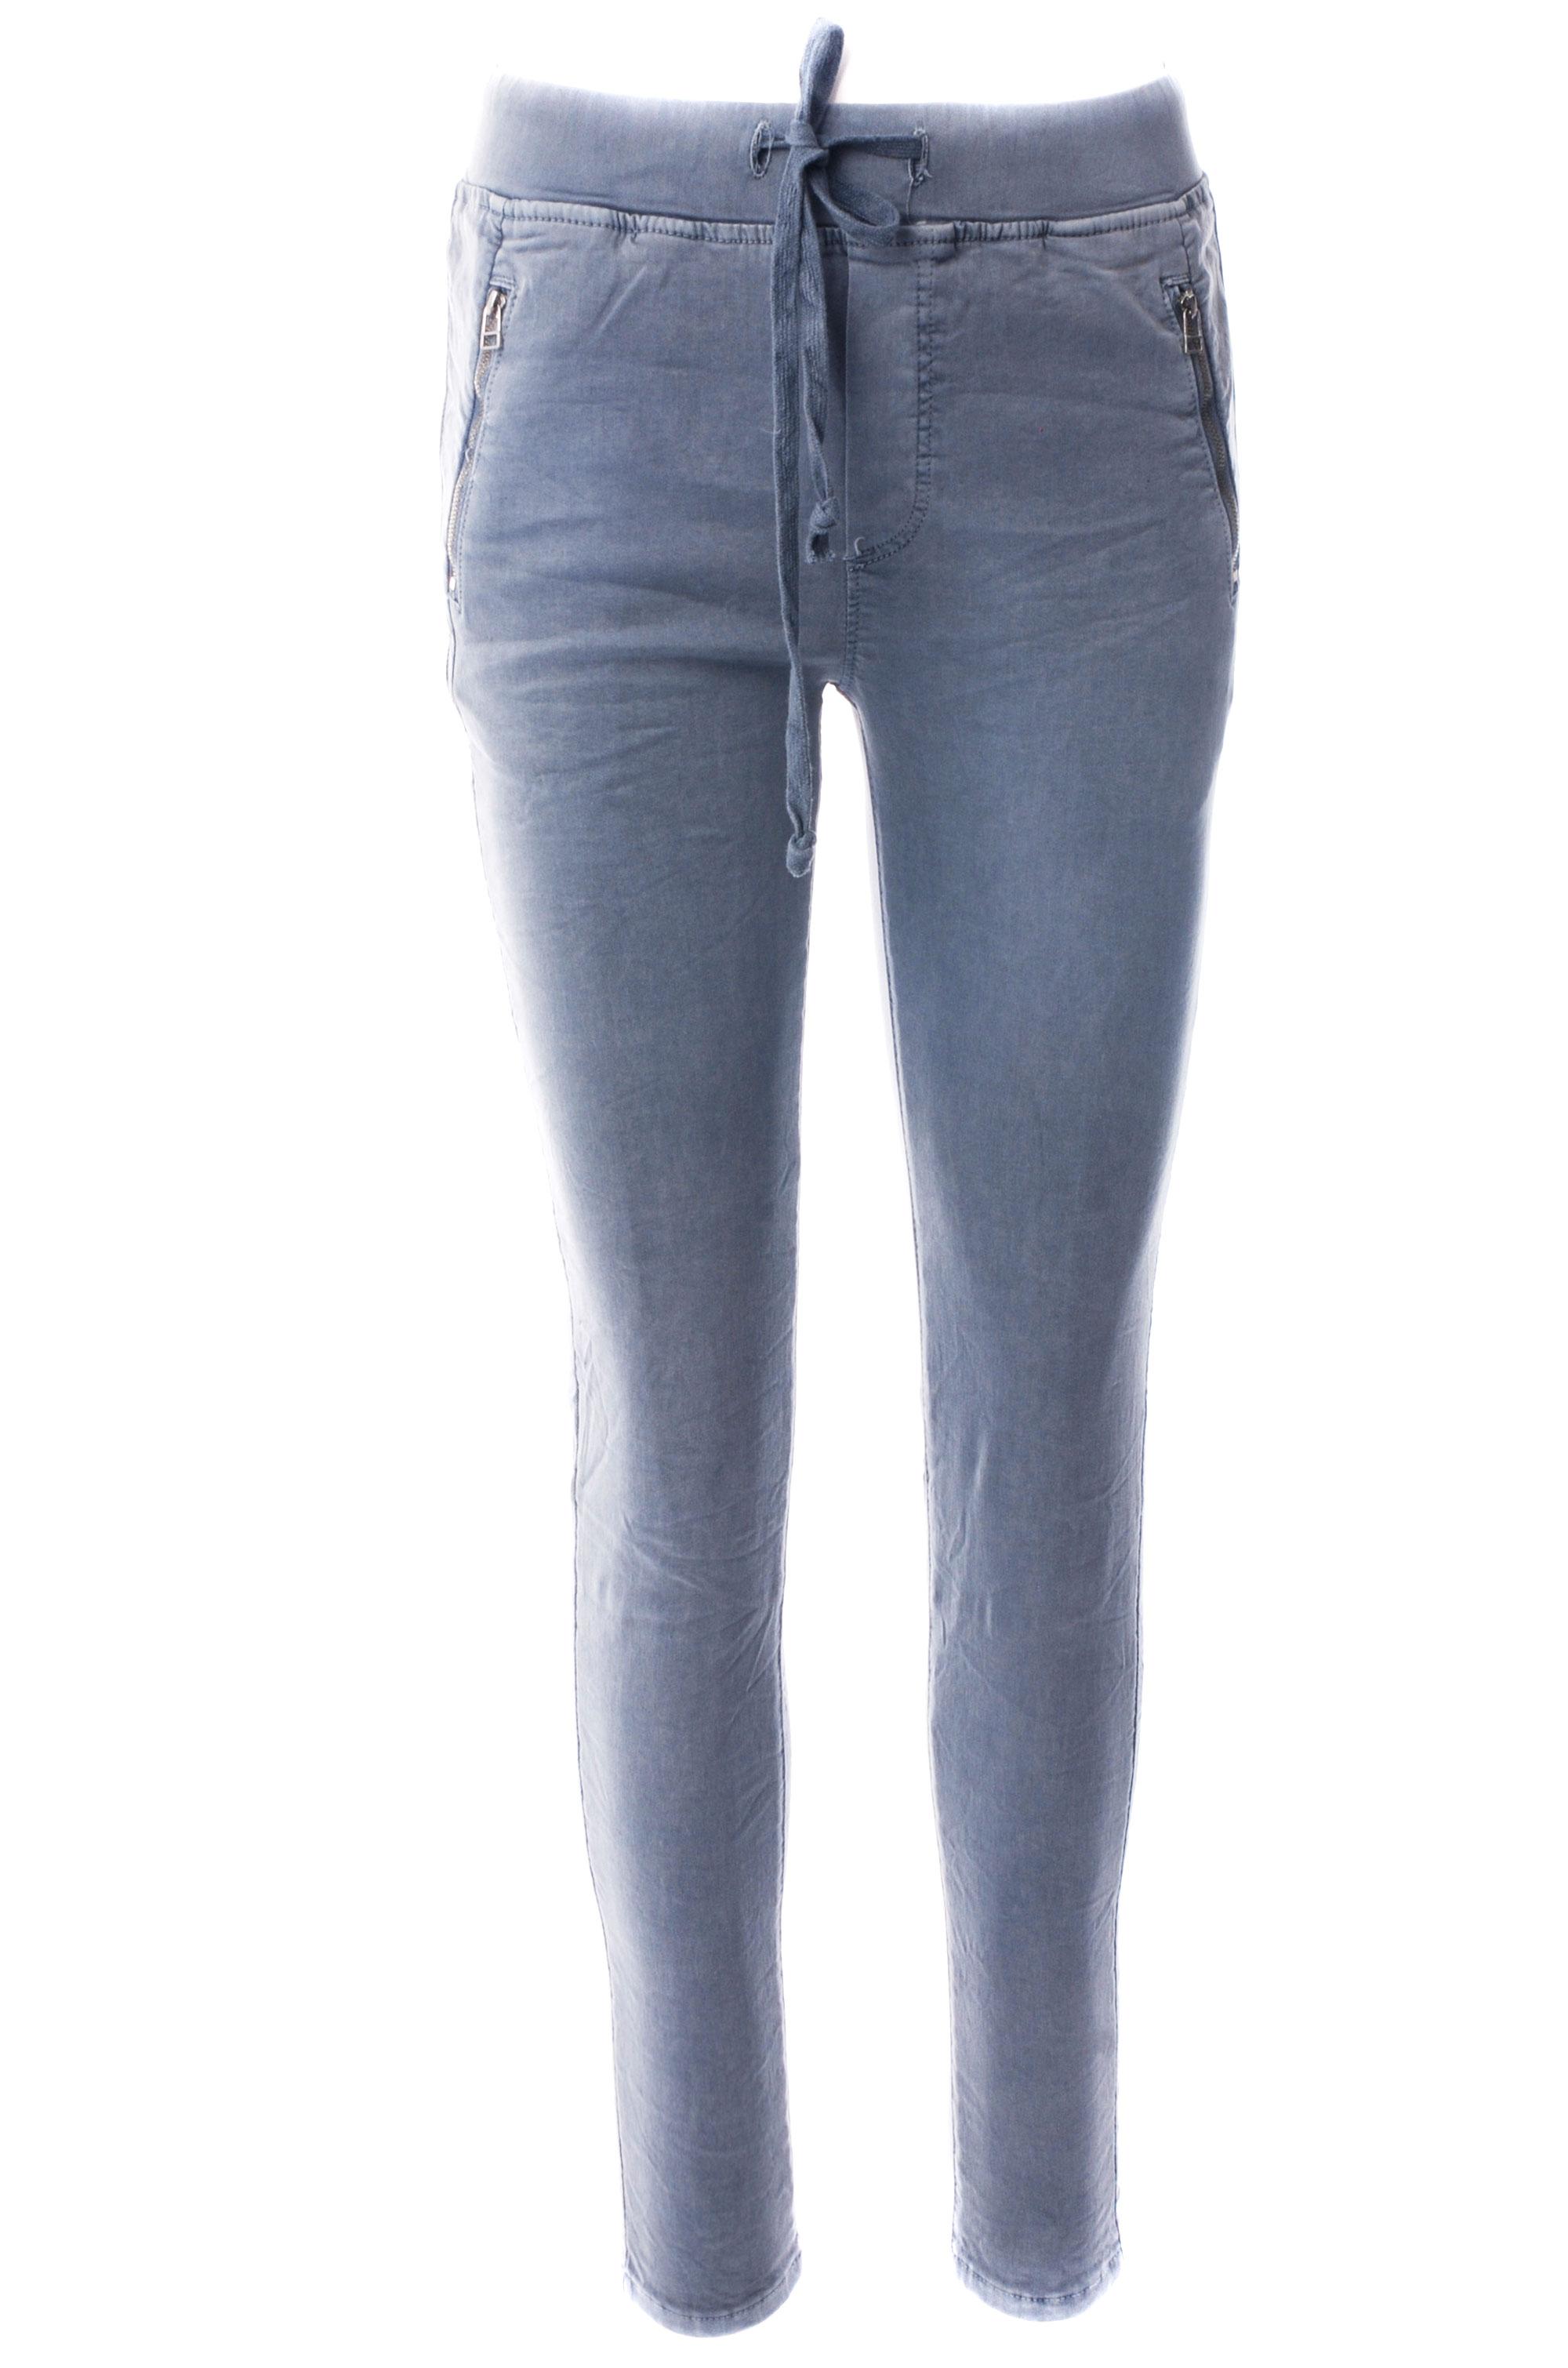 Spodnie - 76-J9903 GRCH - Unisono